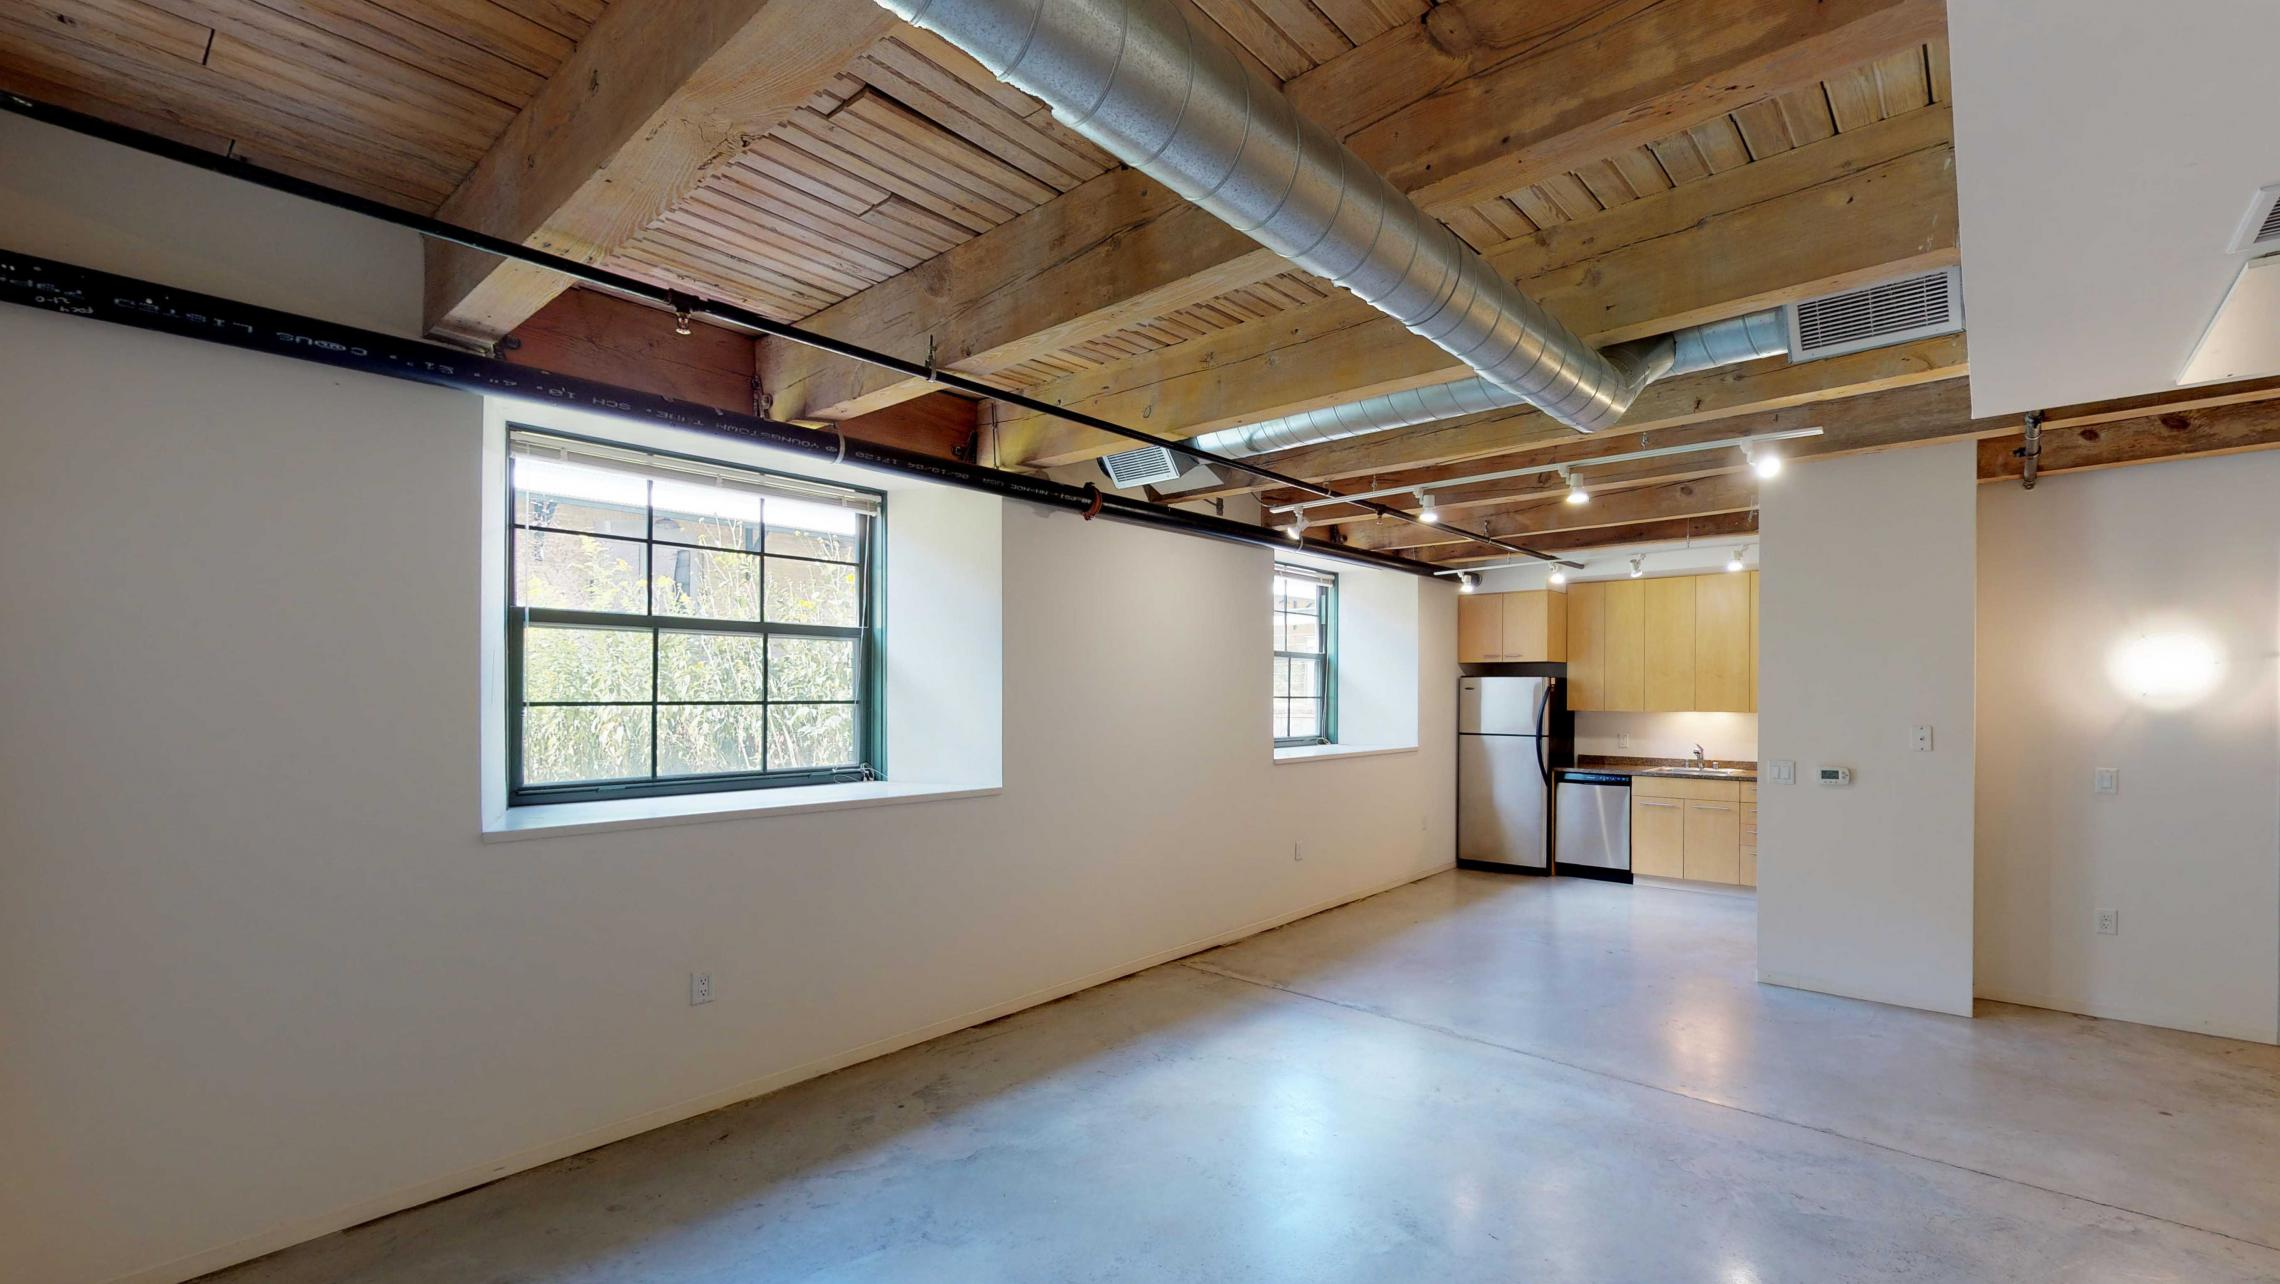 Tobacco-Lofts-Apartment-E102-Kitchen-Historic-Downtown-Madison-Polished-Concrete